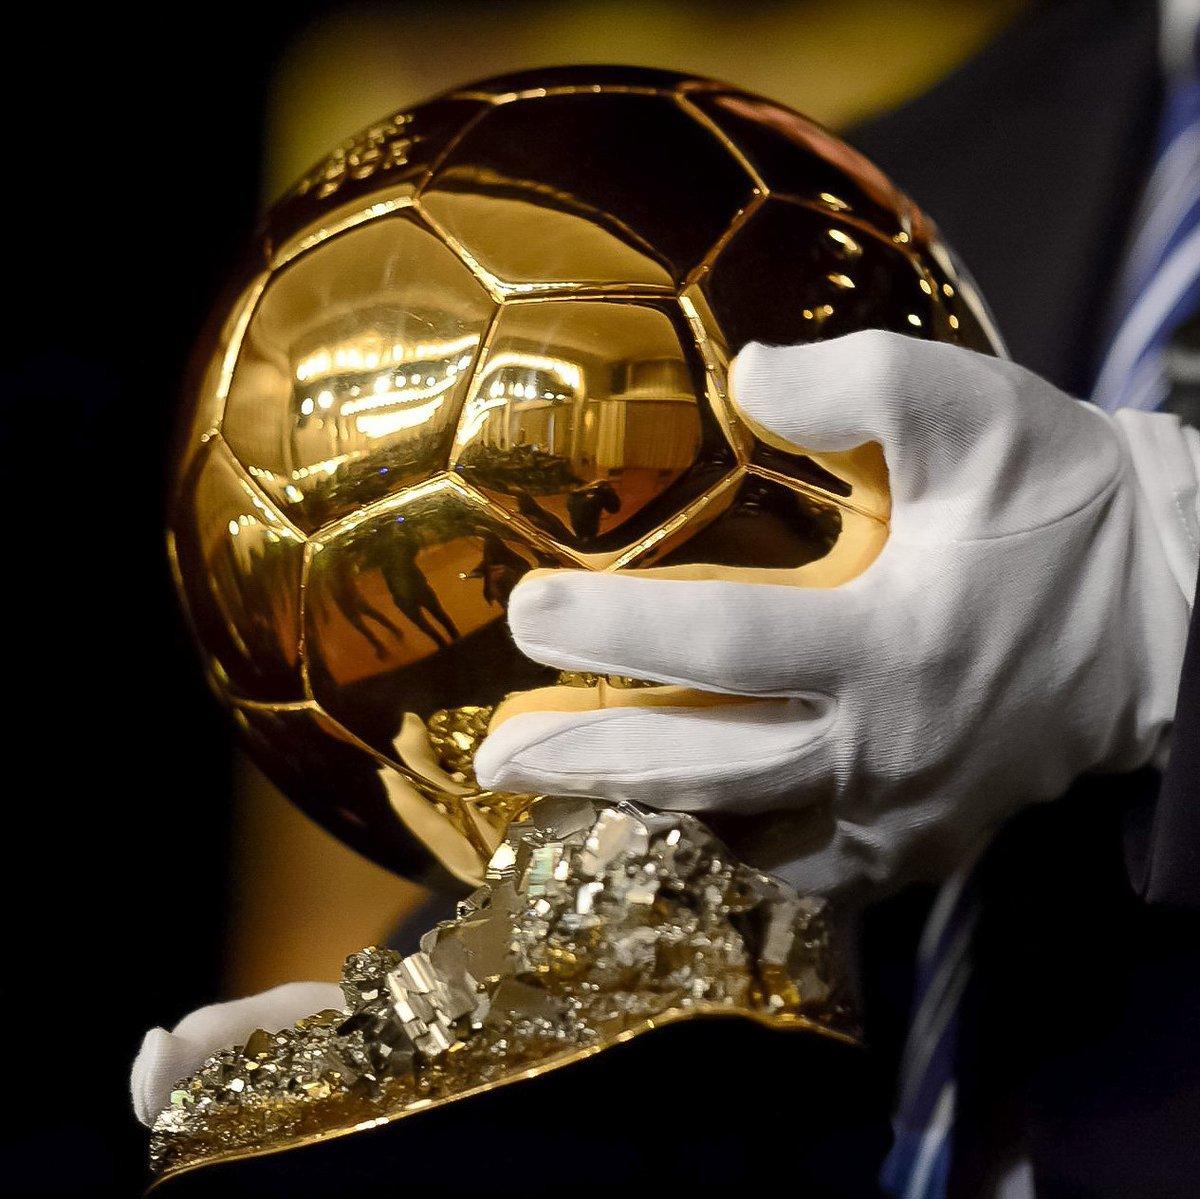 🏆2018 Ballon d'Or winner will be _______  #UCL